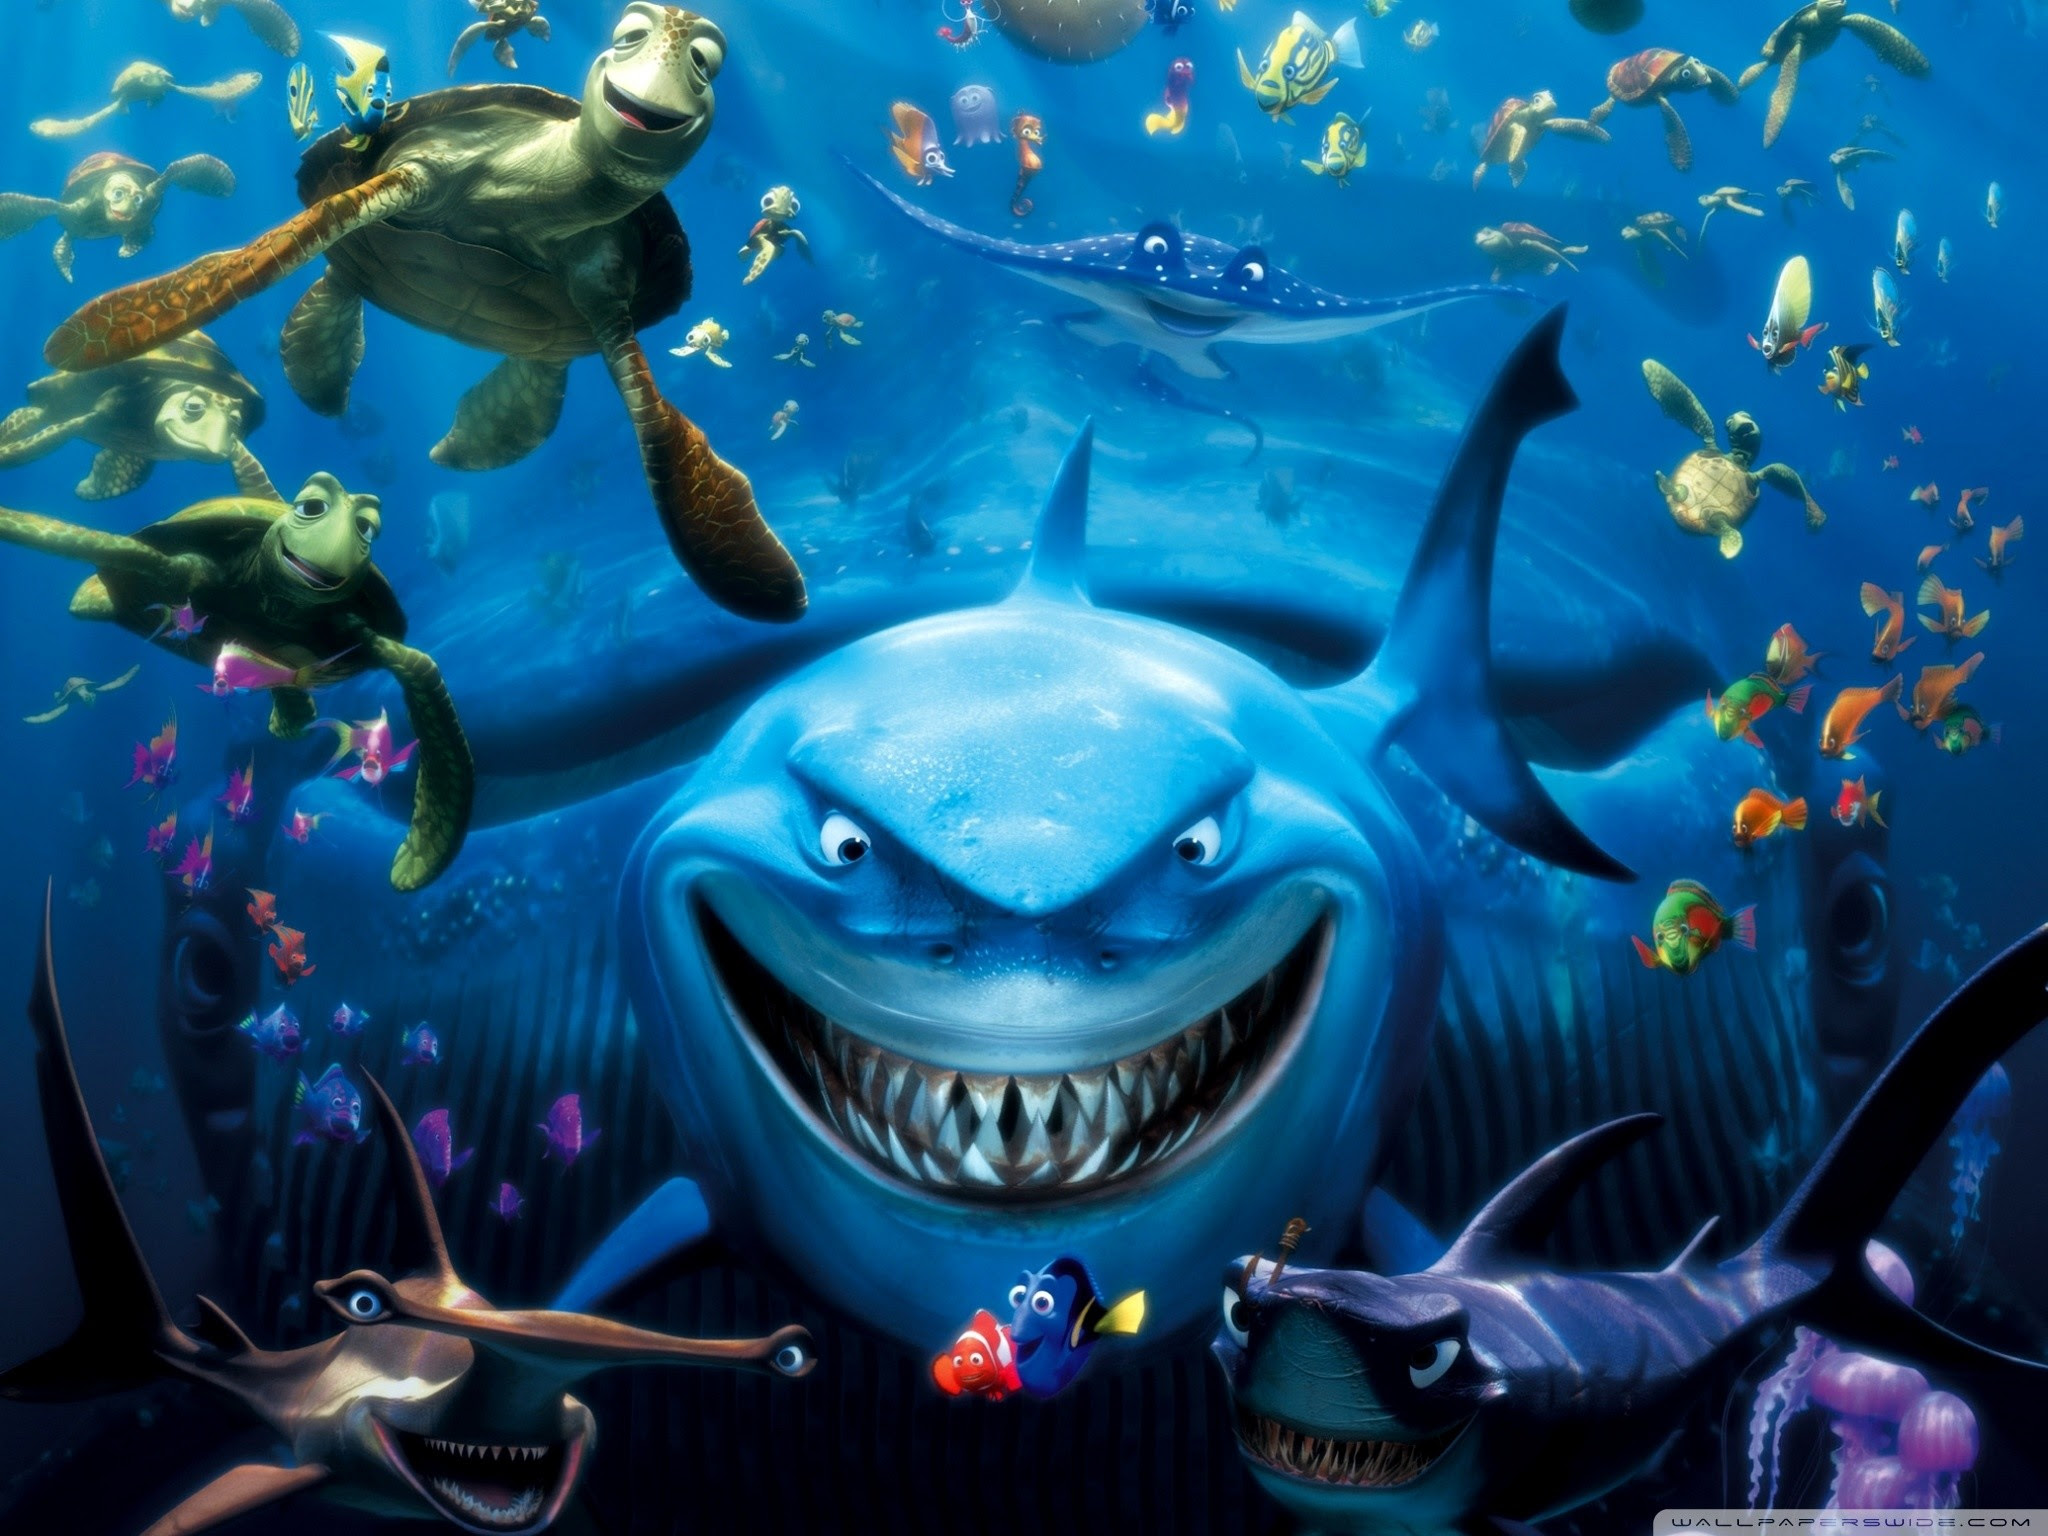 Download 910 Wallpaper Iphone Nemo Gambar Paling Keren